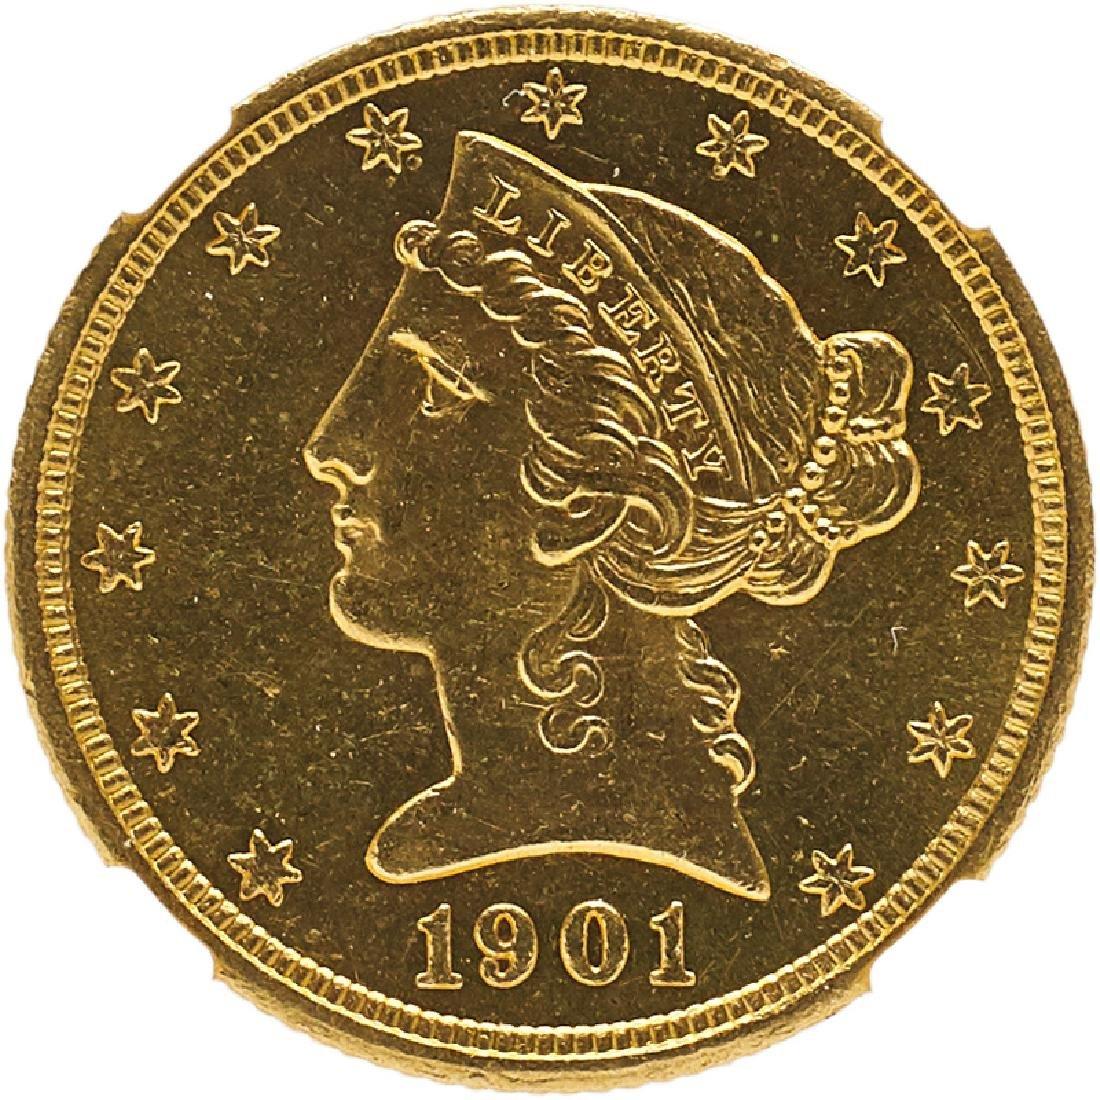 U.S. 1901-S LIBERTY $5 GOLD COIN